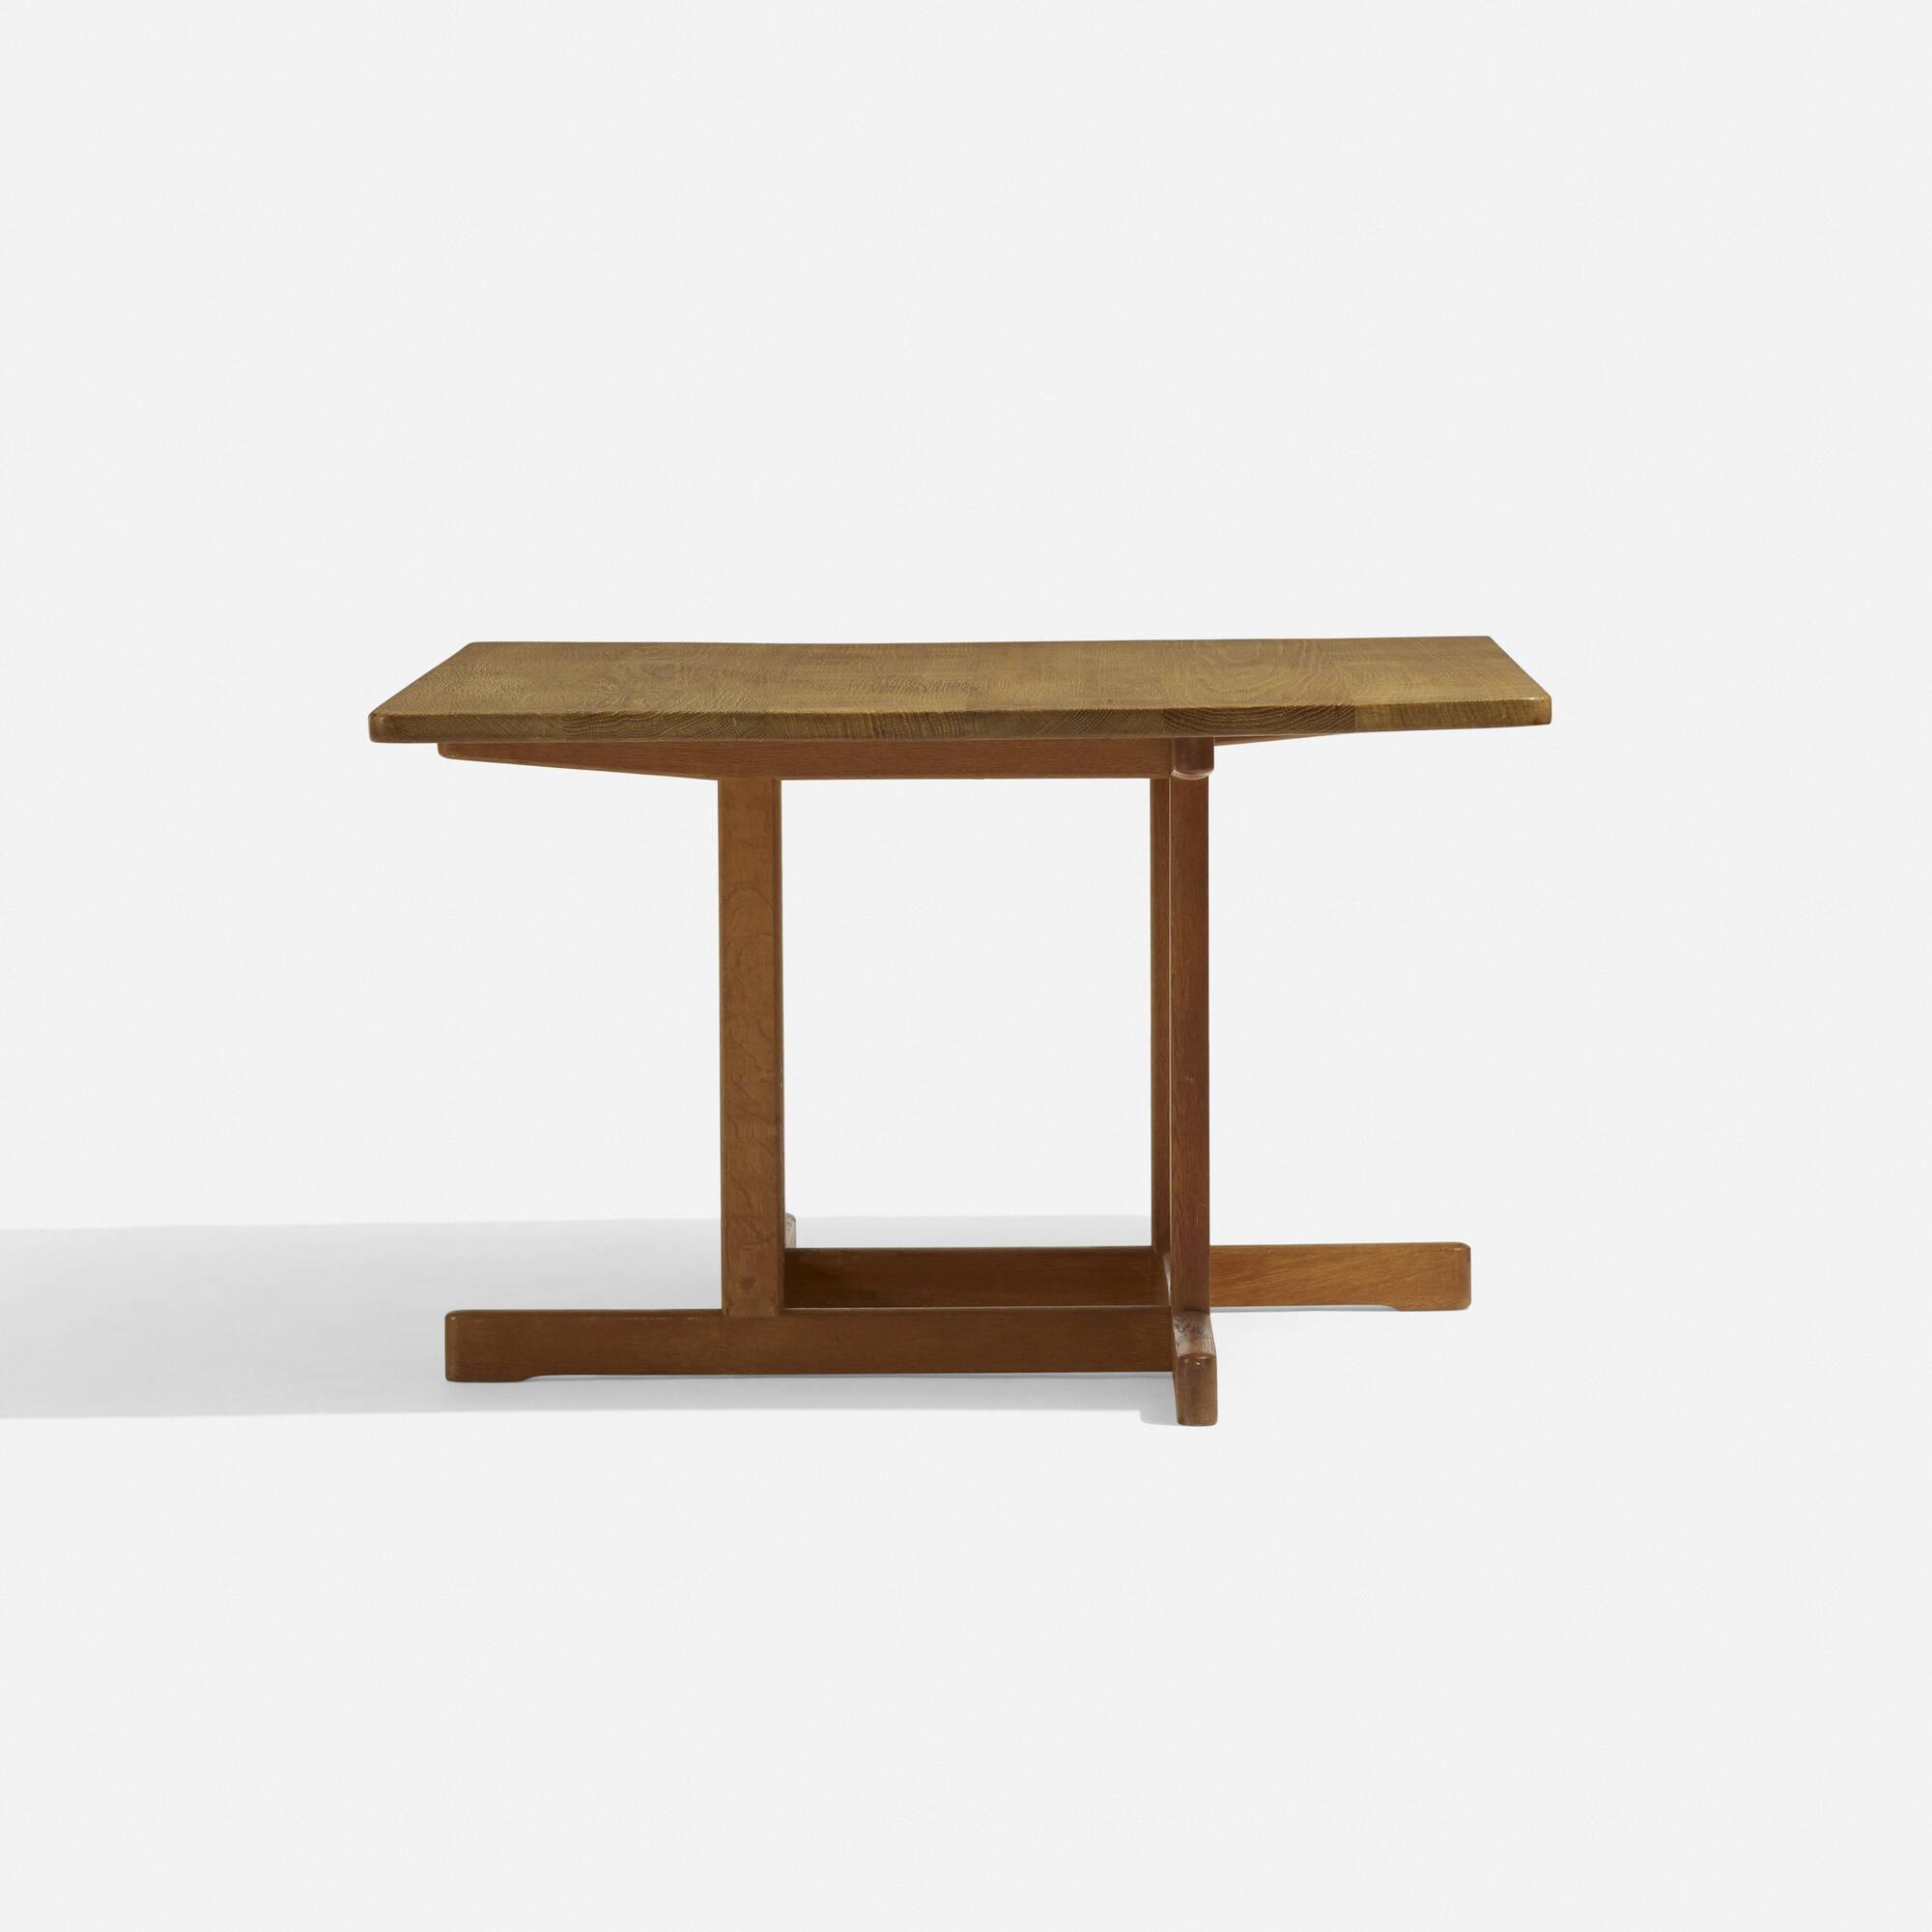 235: Børge Mogensen / coffee table, model 271 (2 of 3)